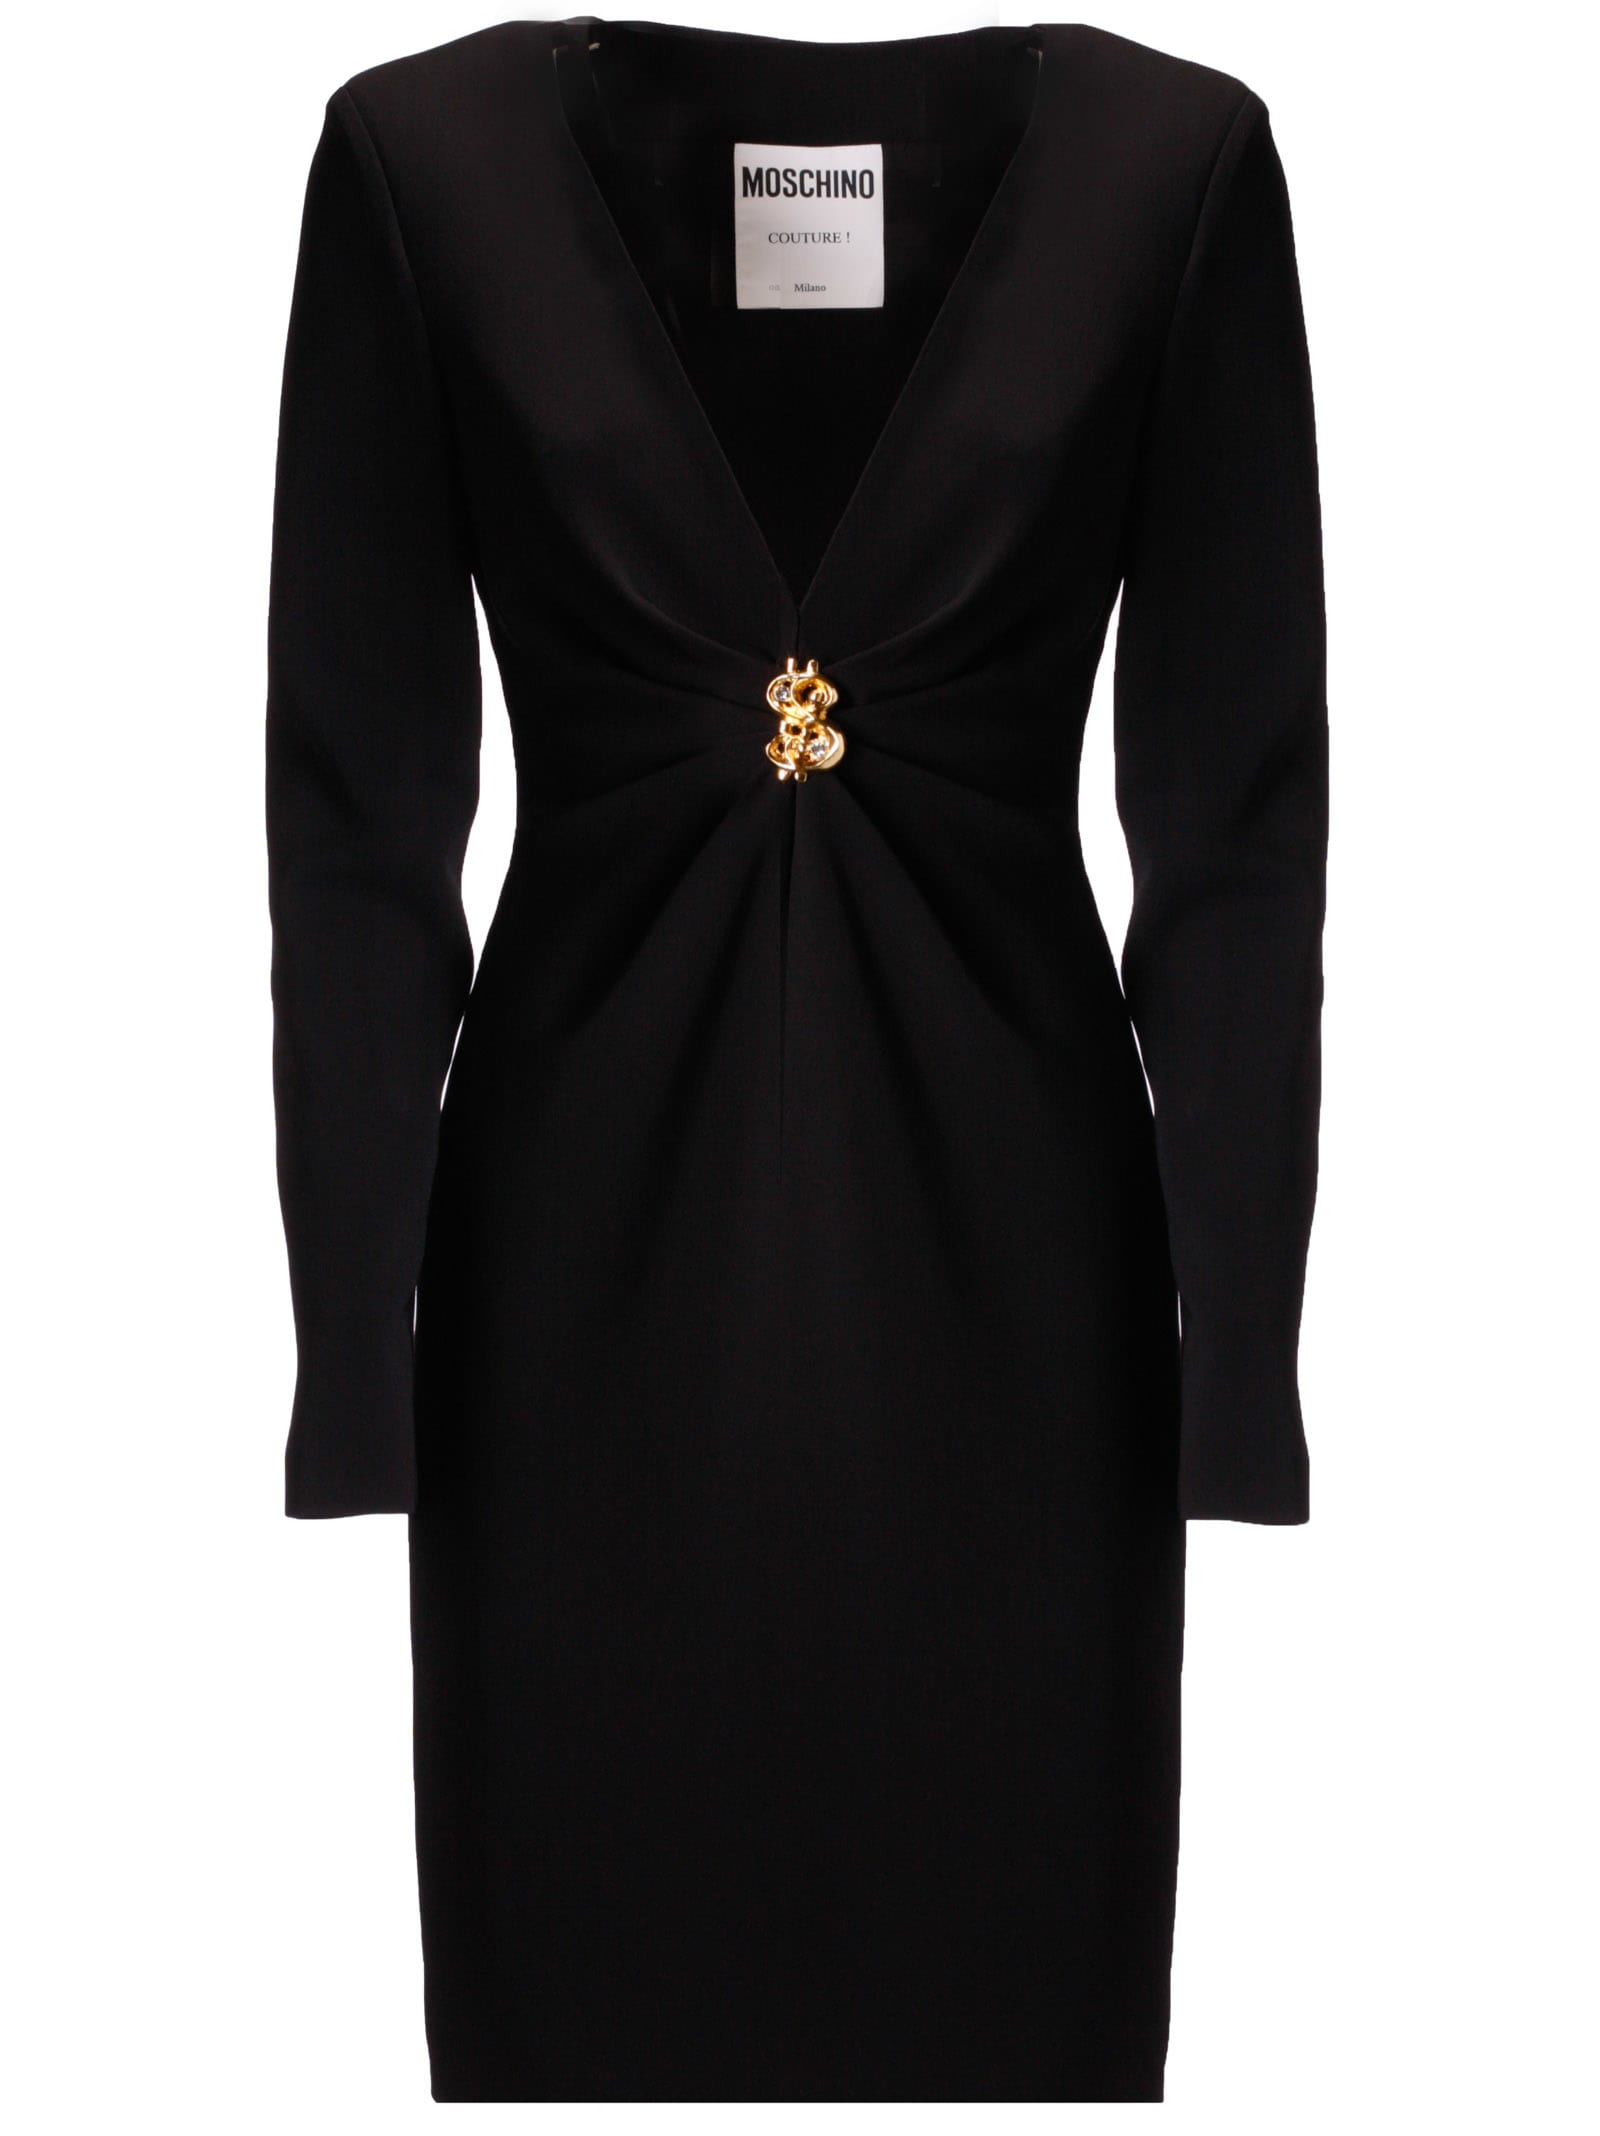 Moschino Ruched Dress